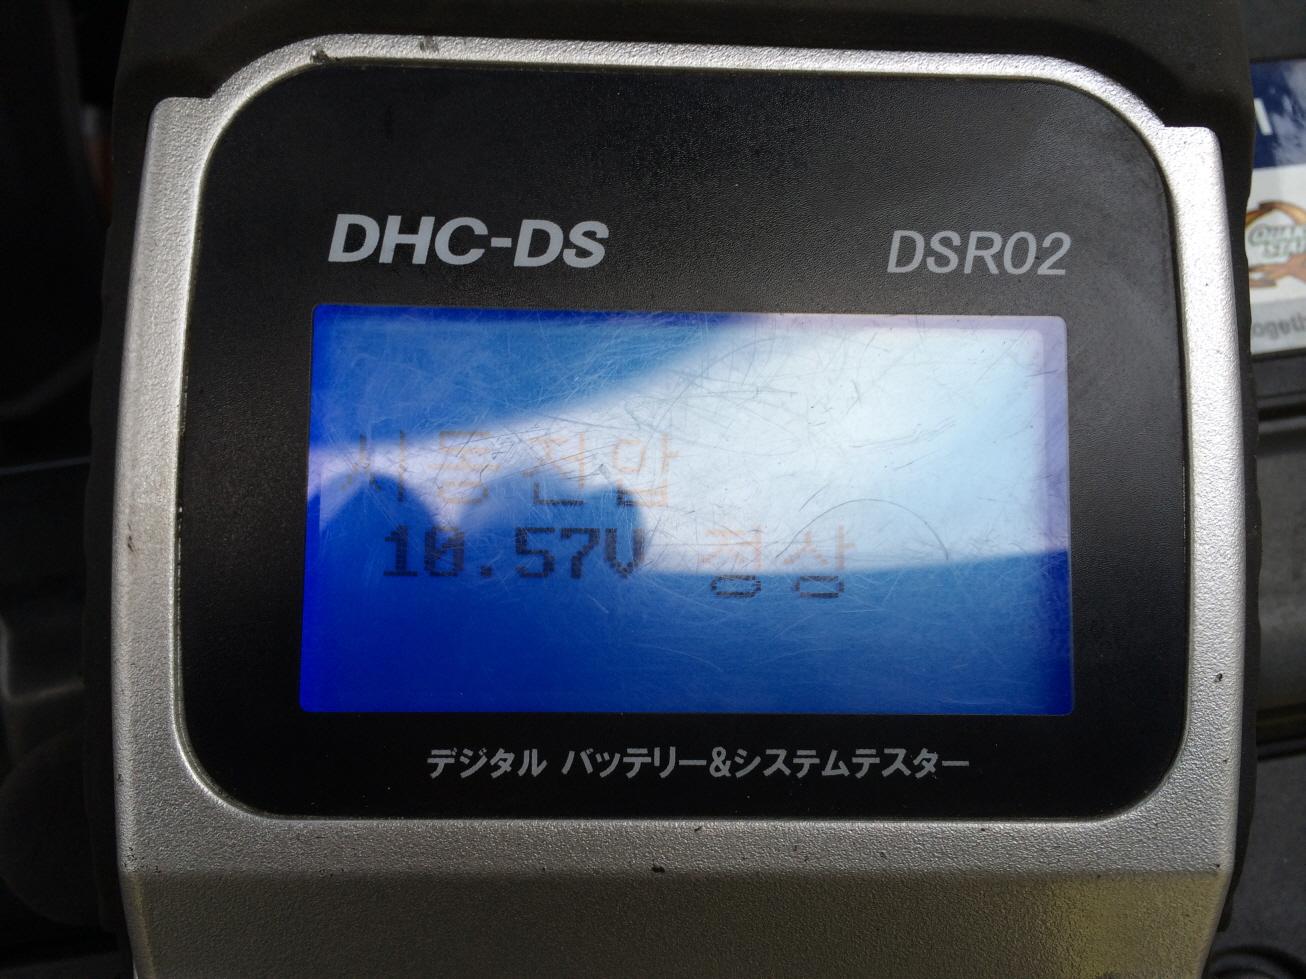 rIMG_2303.JPG